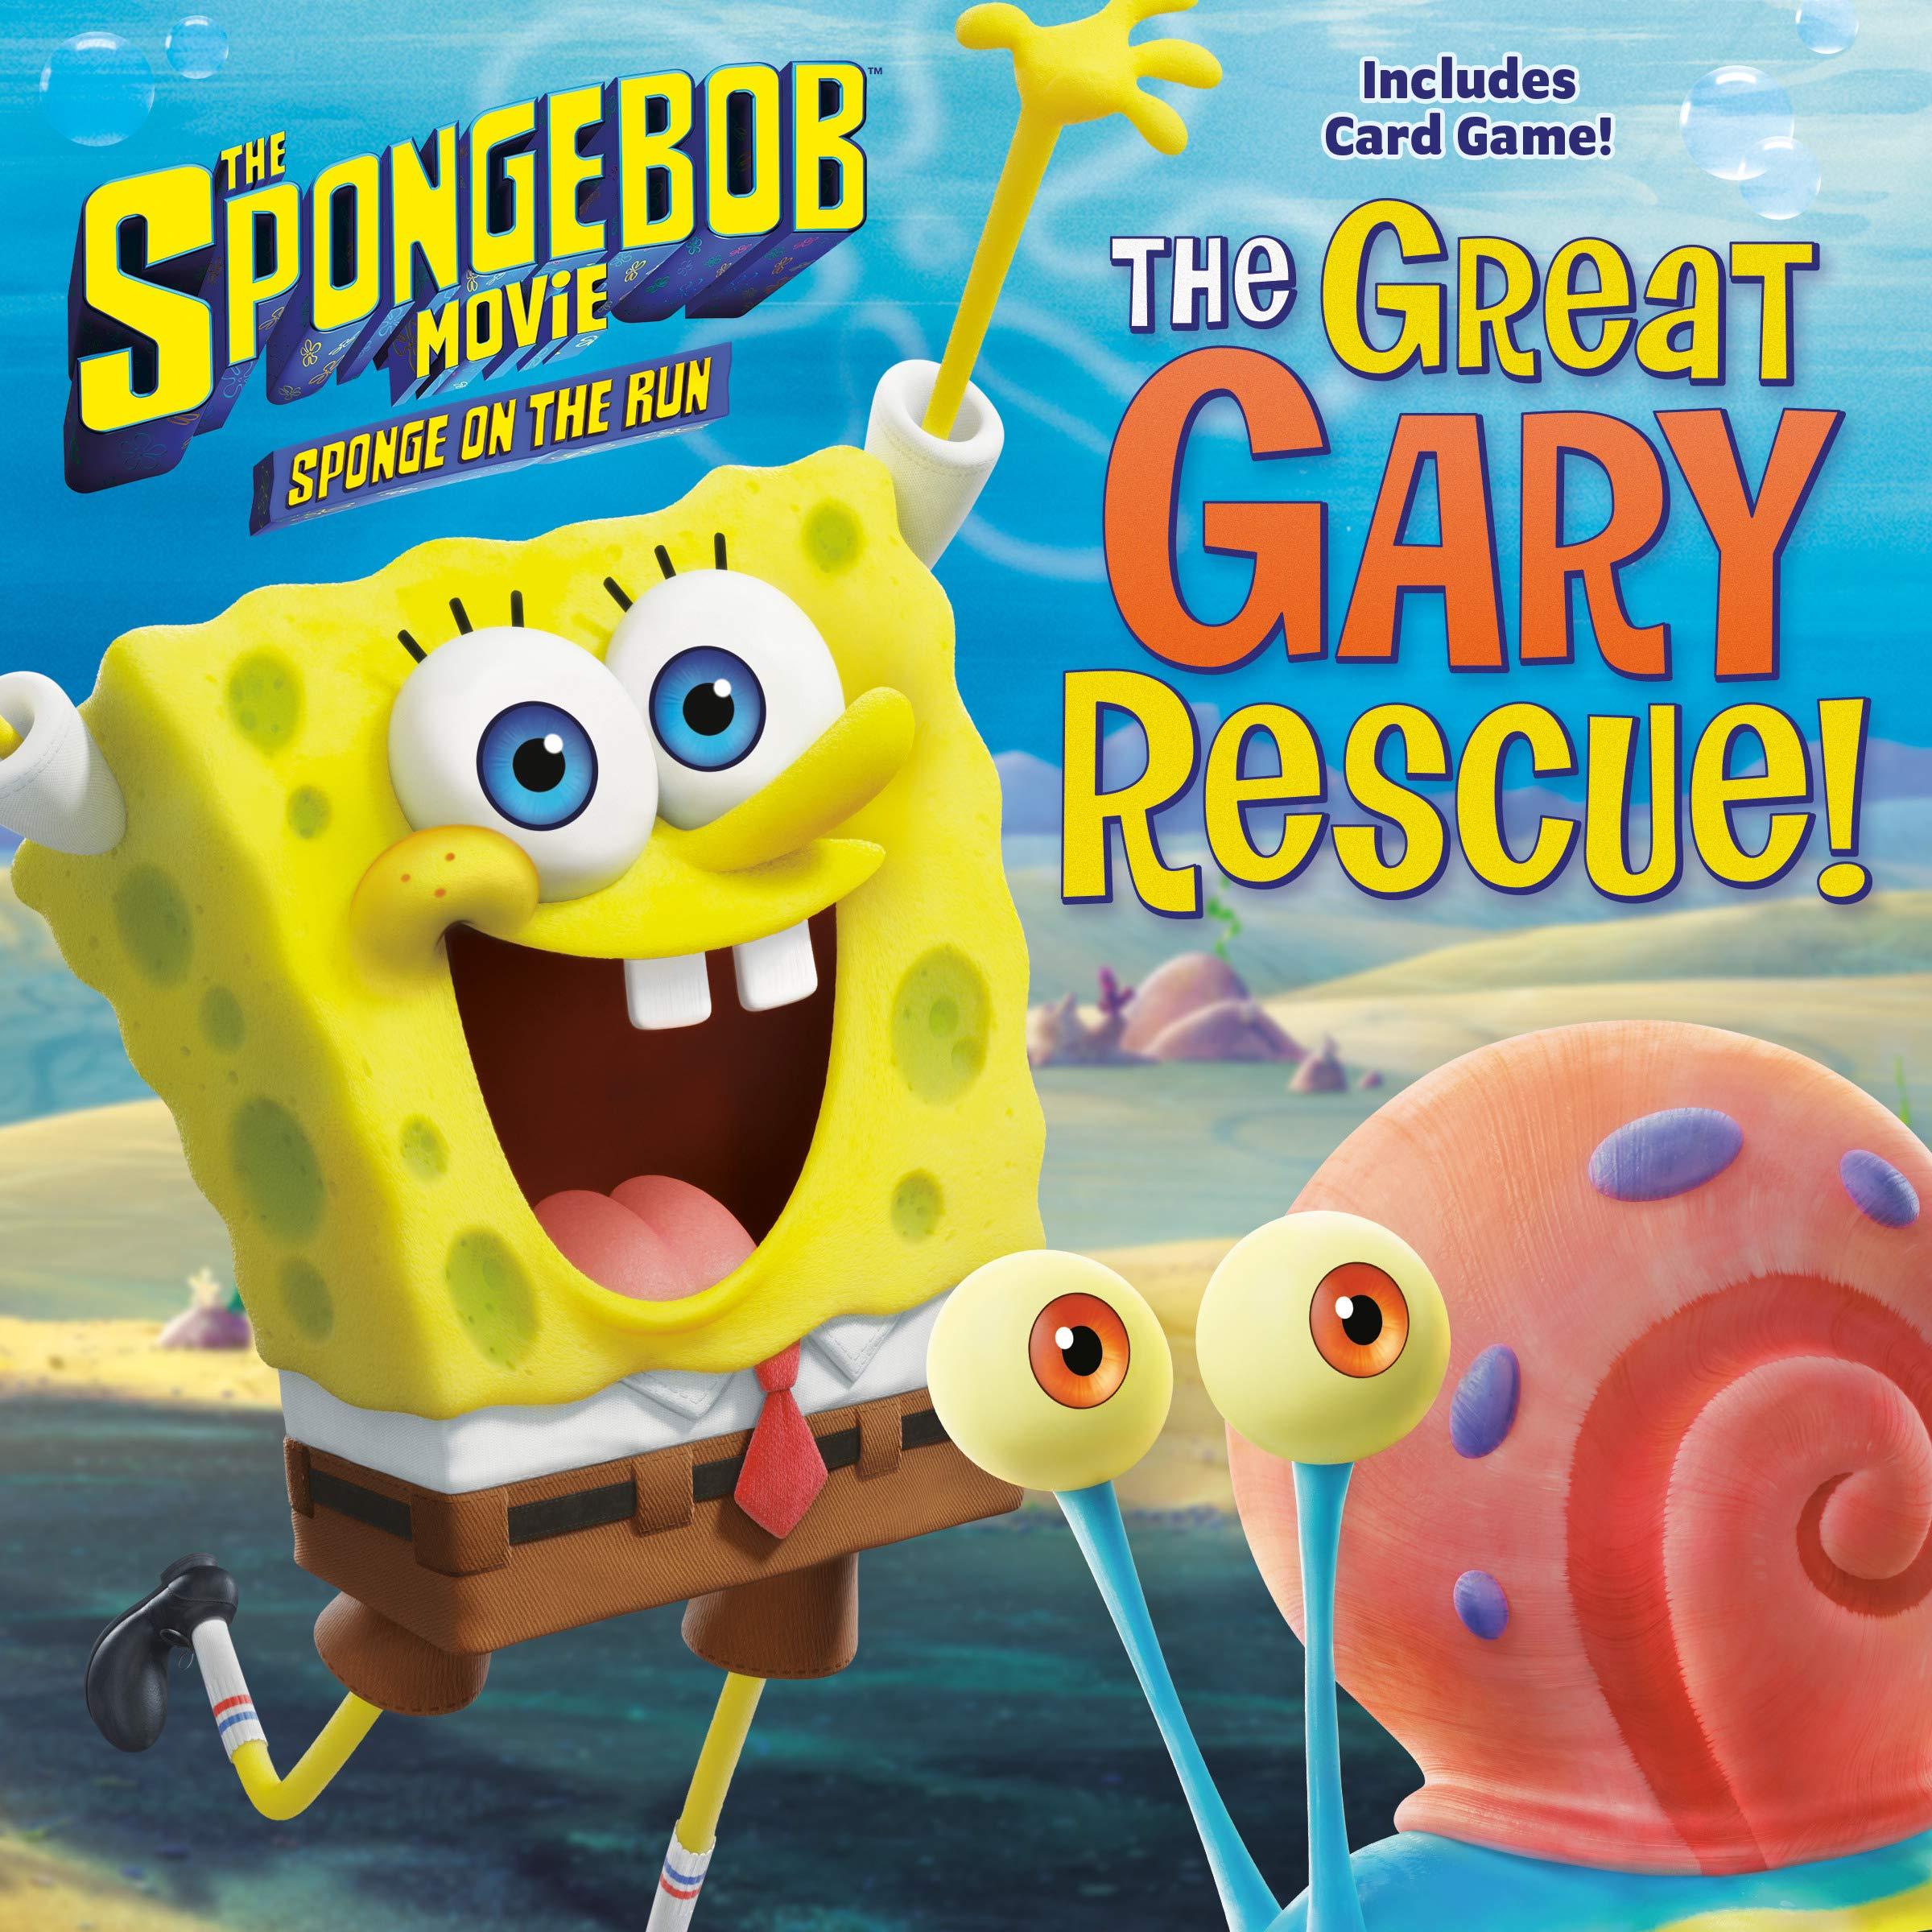 The SpongeBob Movie: Sponge on the Run - The Great Gary Rescue!